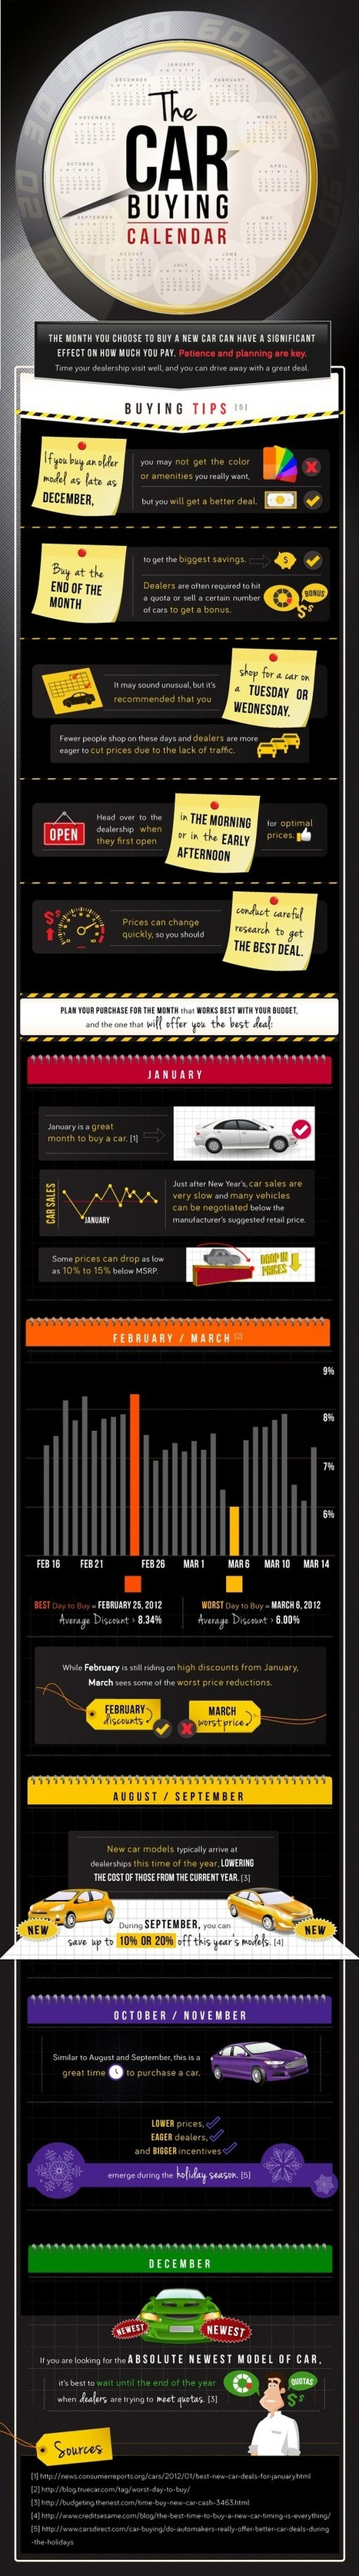 Car-Buying-Saving-Calendar.png (600x4303 pixels) | Top 5 Infographics | Scoop.it